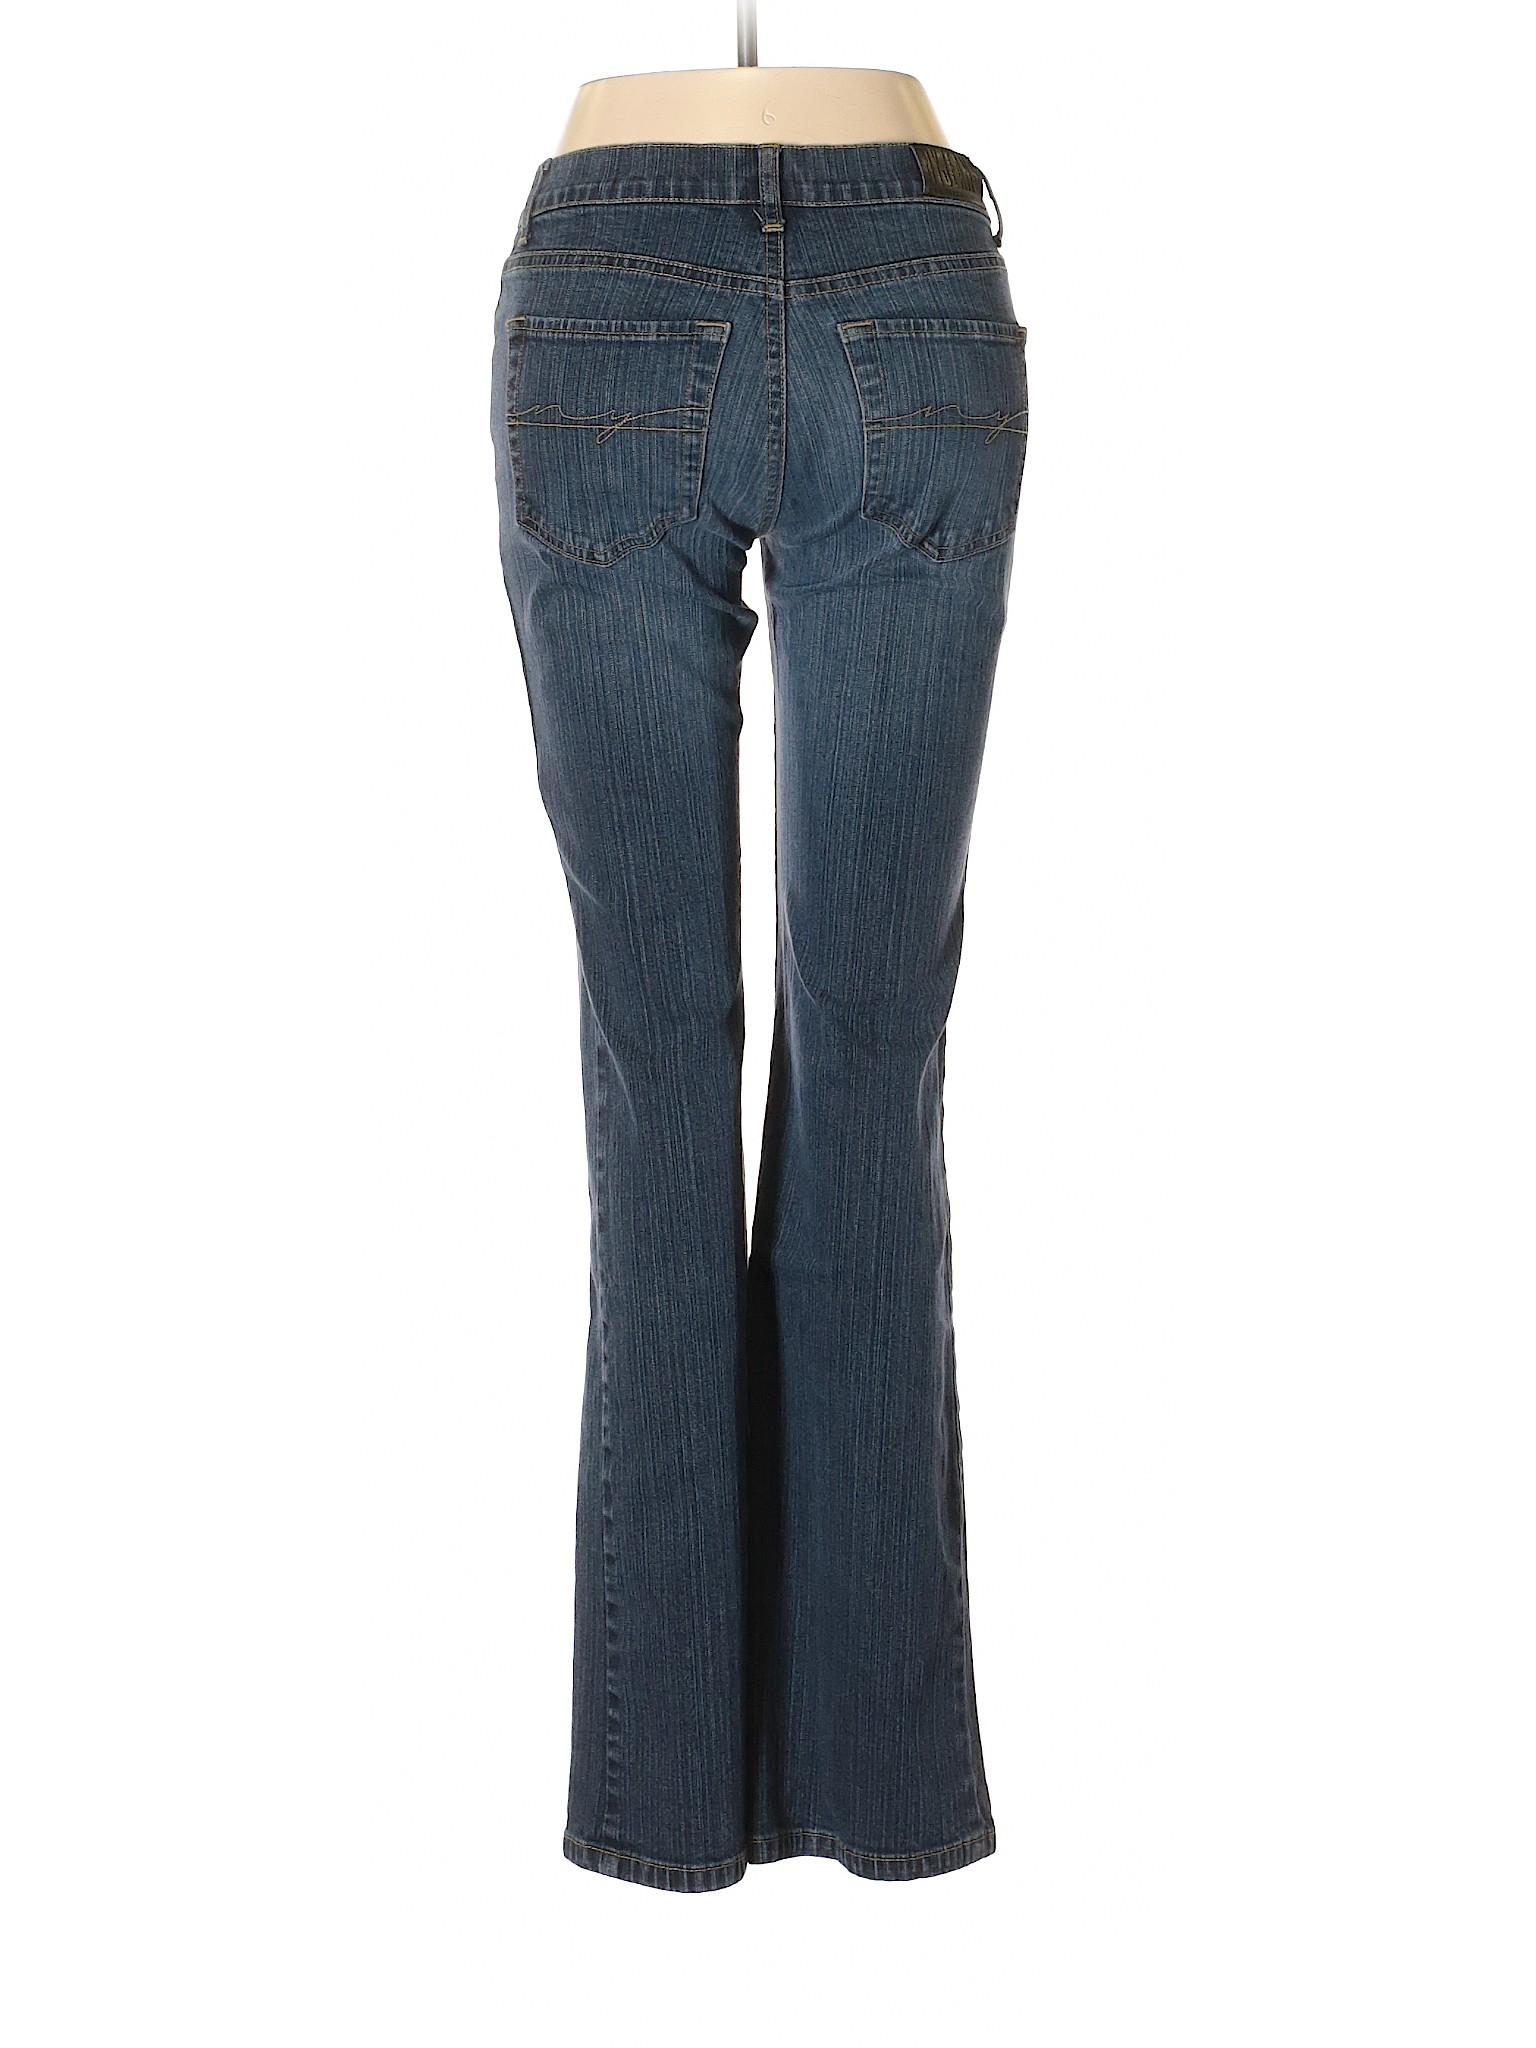 NY Jeans NY Promotion Promotion NY Promotion Jeans Jeans NY Promotion 7qfpcBw